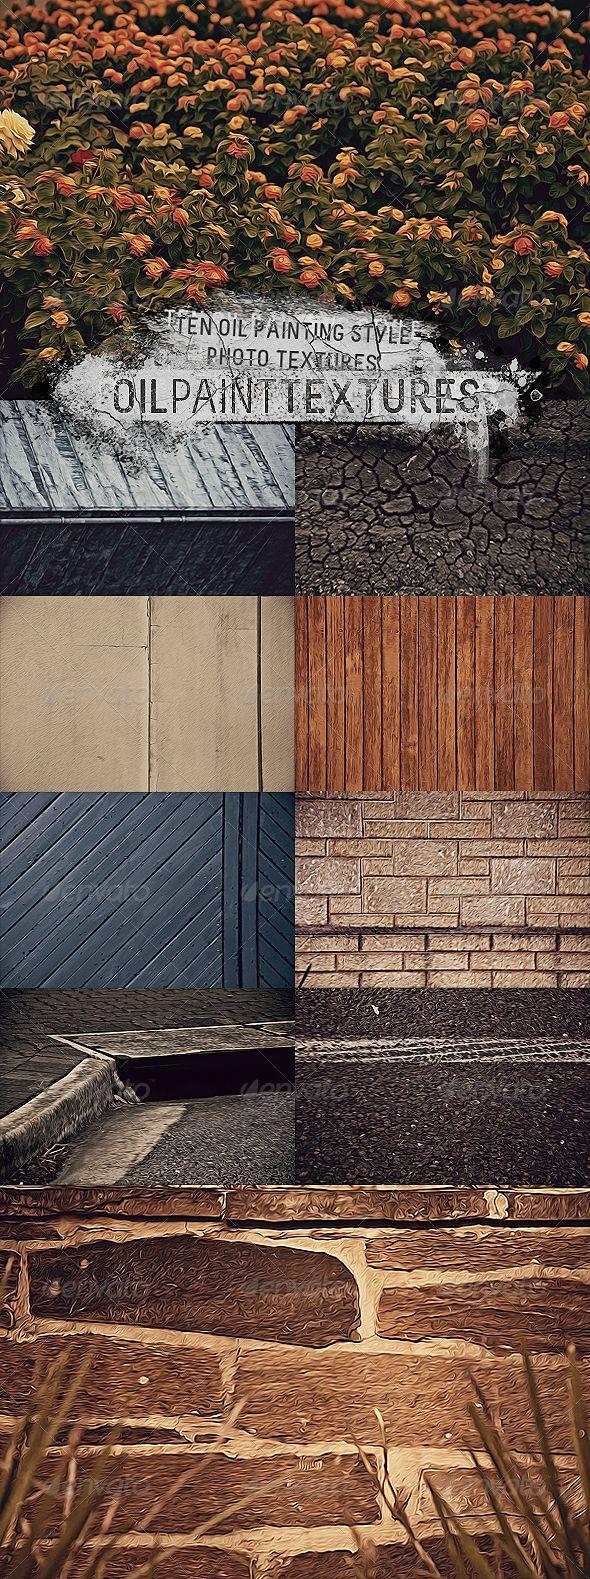 Textures architecture roads roads dirt road texture seamless - Creative Oil Painting Style Photo Textures Dirt Texturenikon